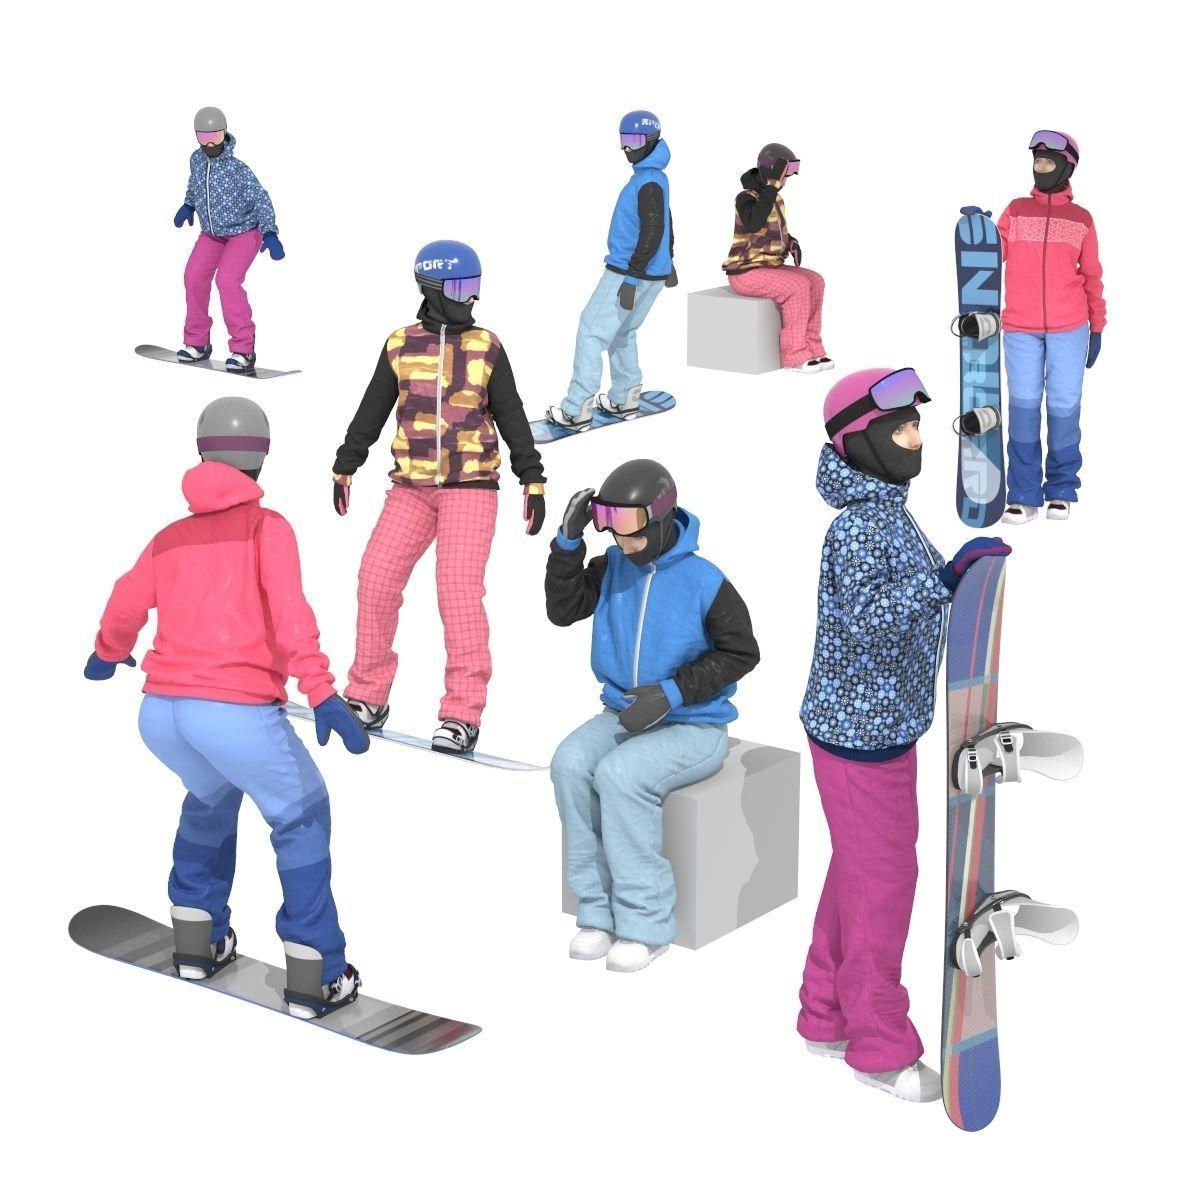 Snowboarder Girls 3D Model